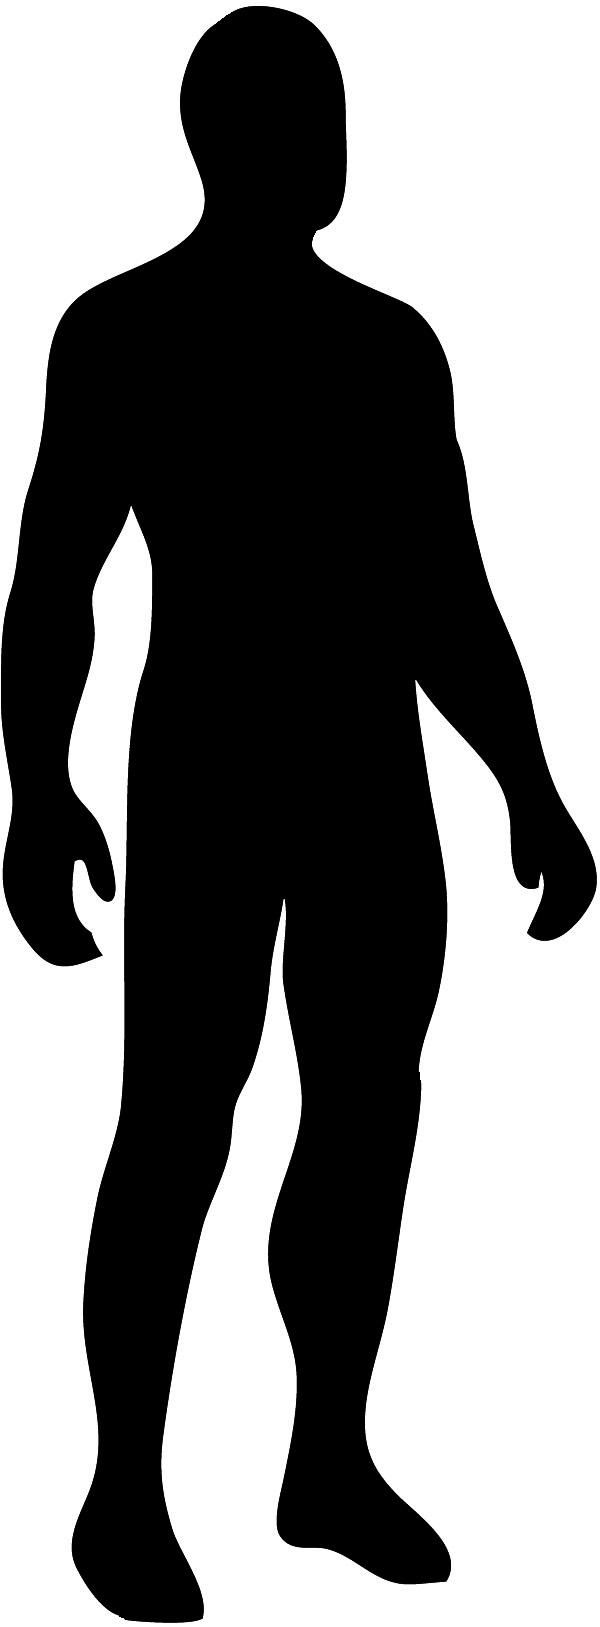 Clipart Human